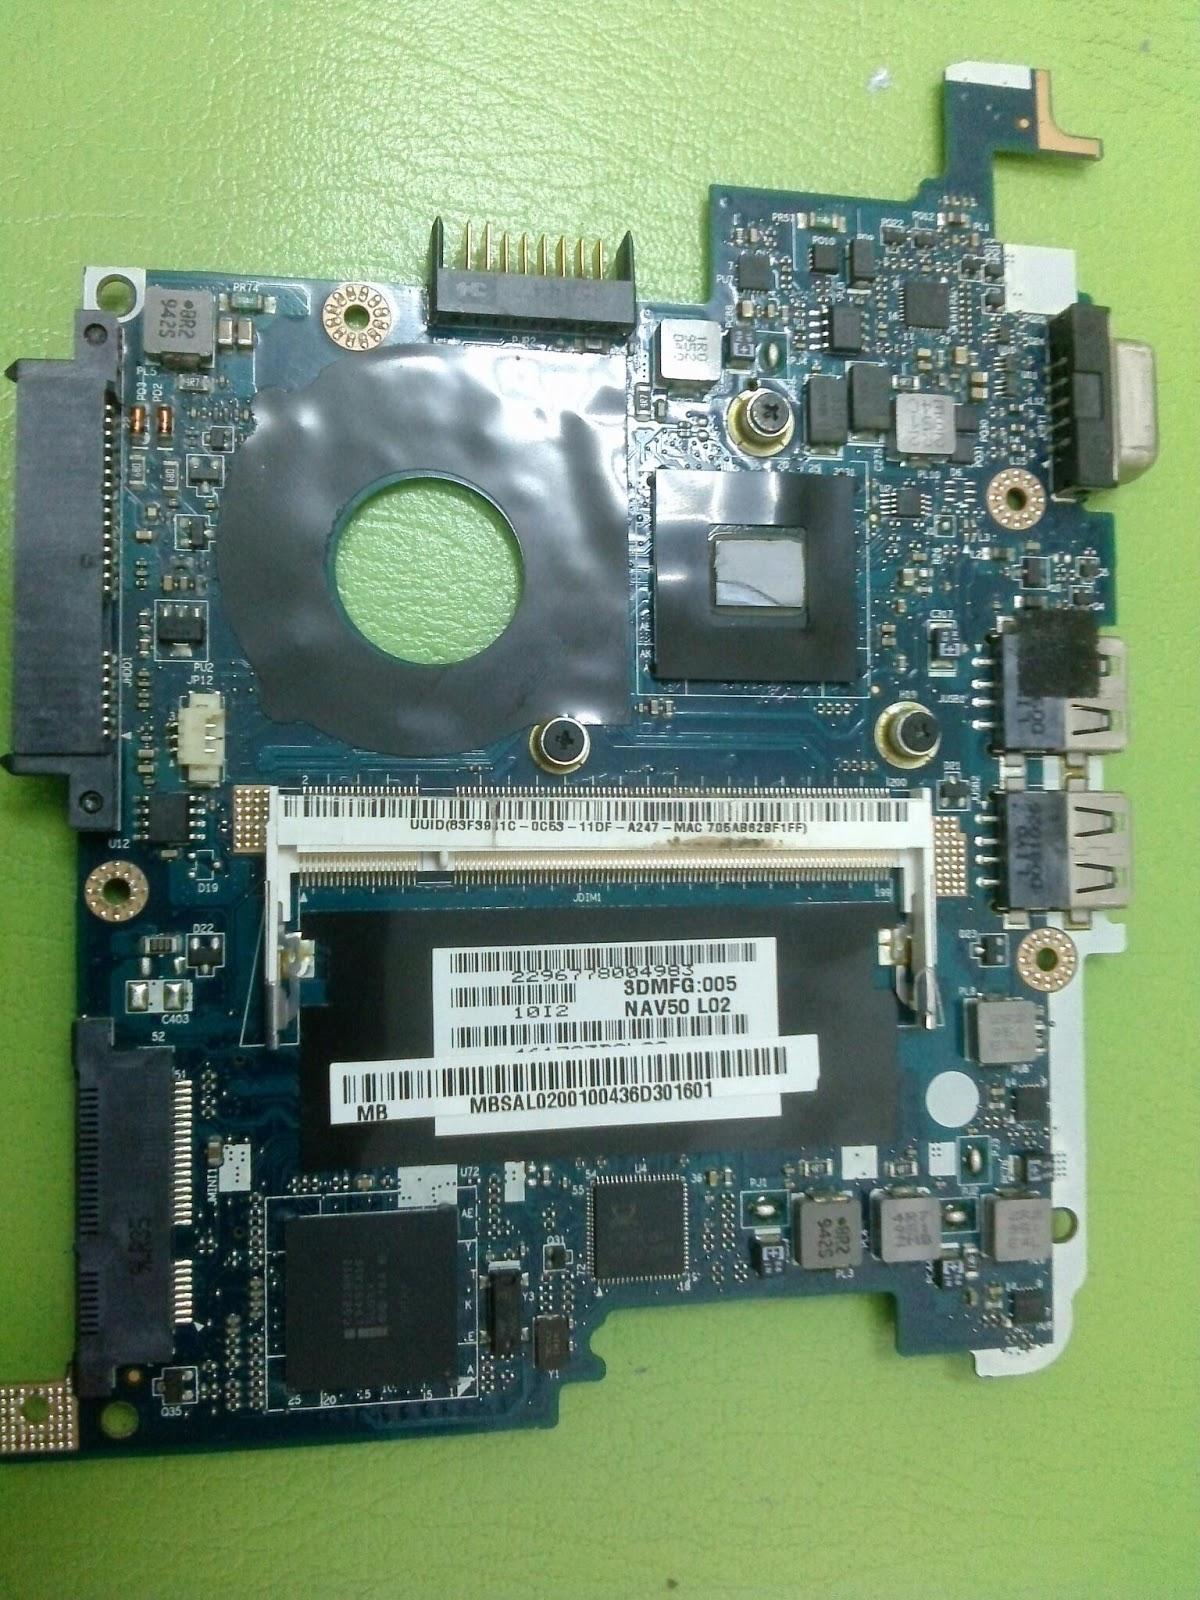 Acer Aspire ONE D260 NAV50 - Brak obrazu.